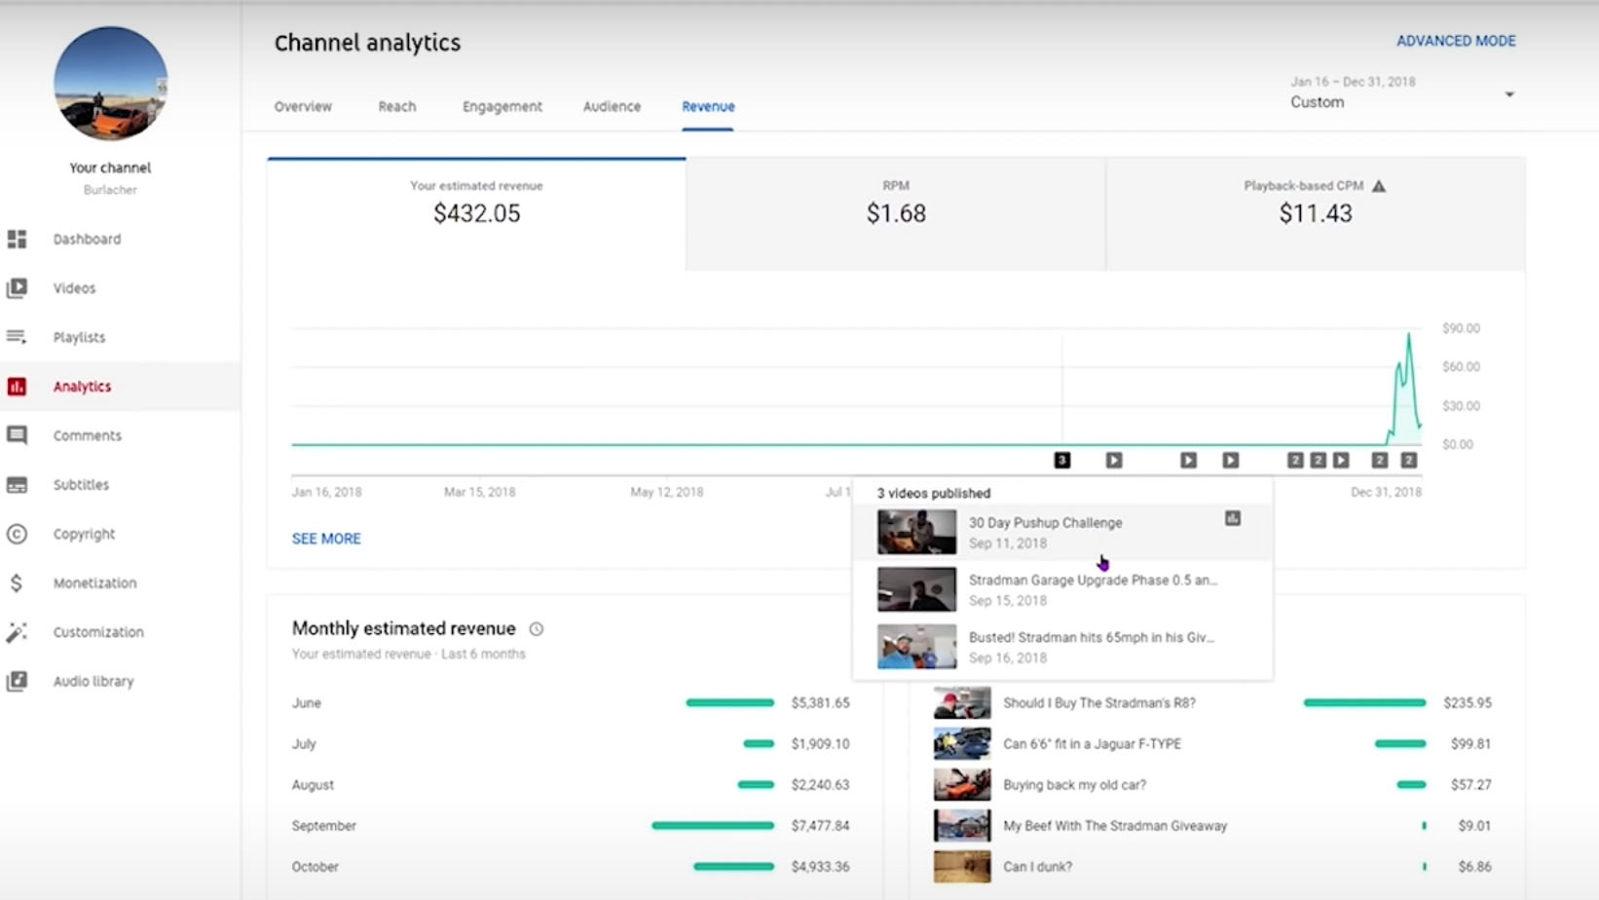 Burlacher YouTube finances